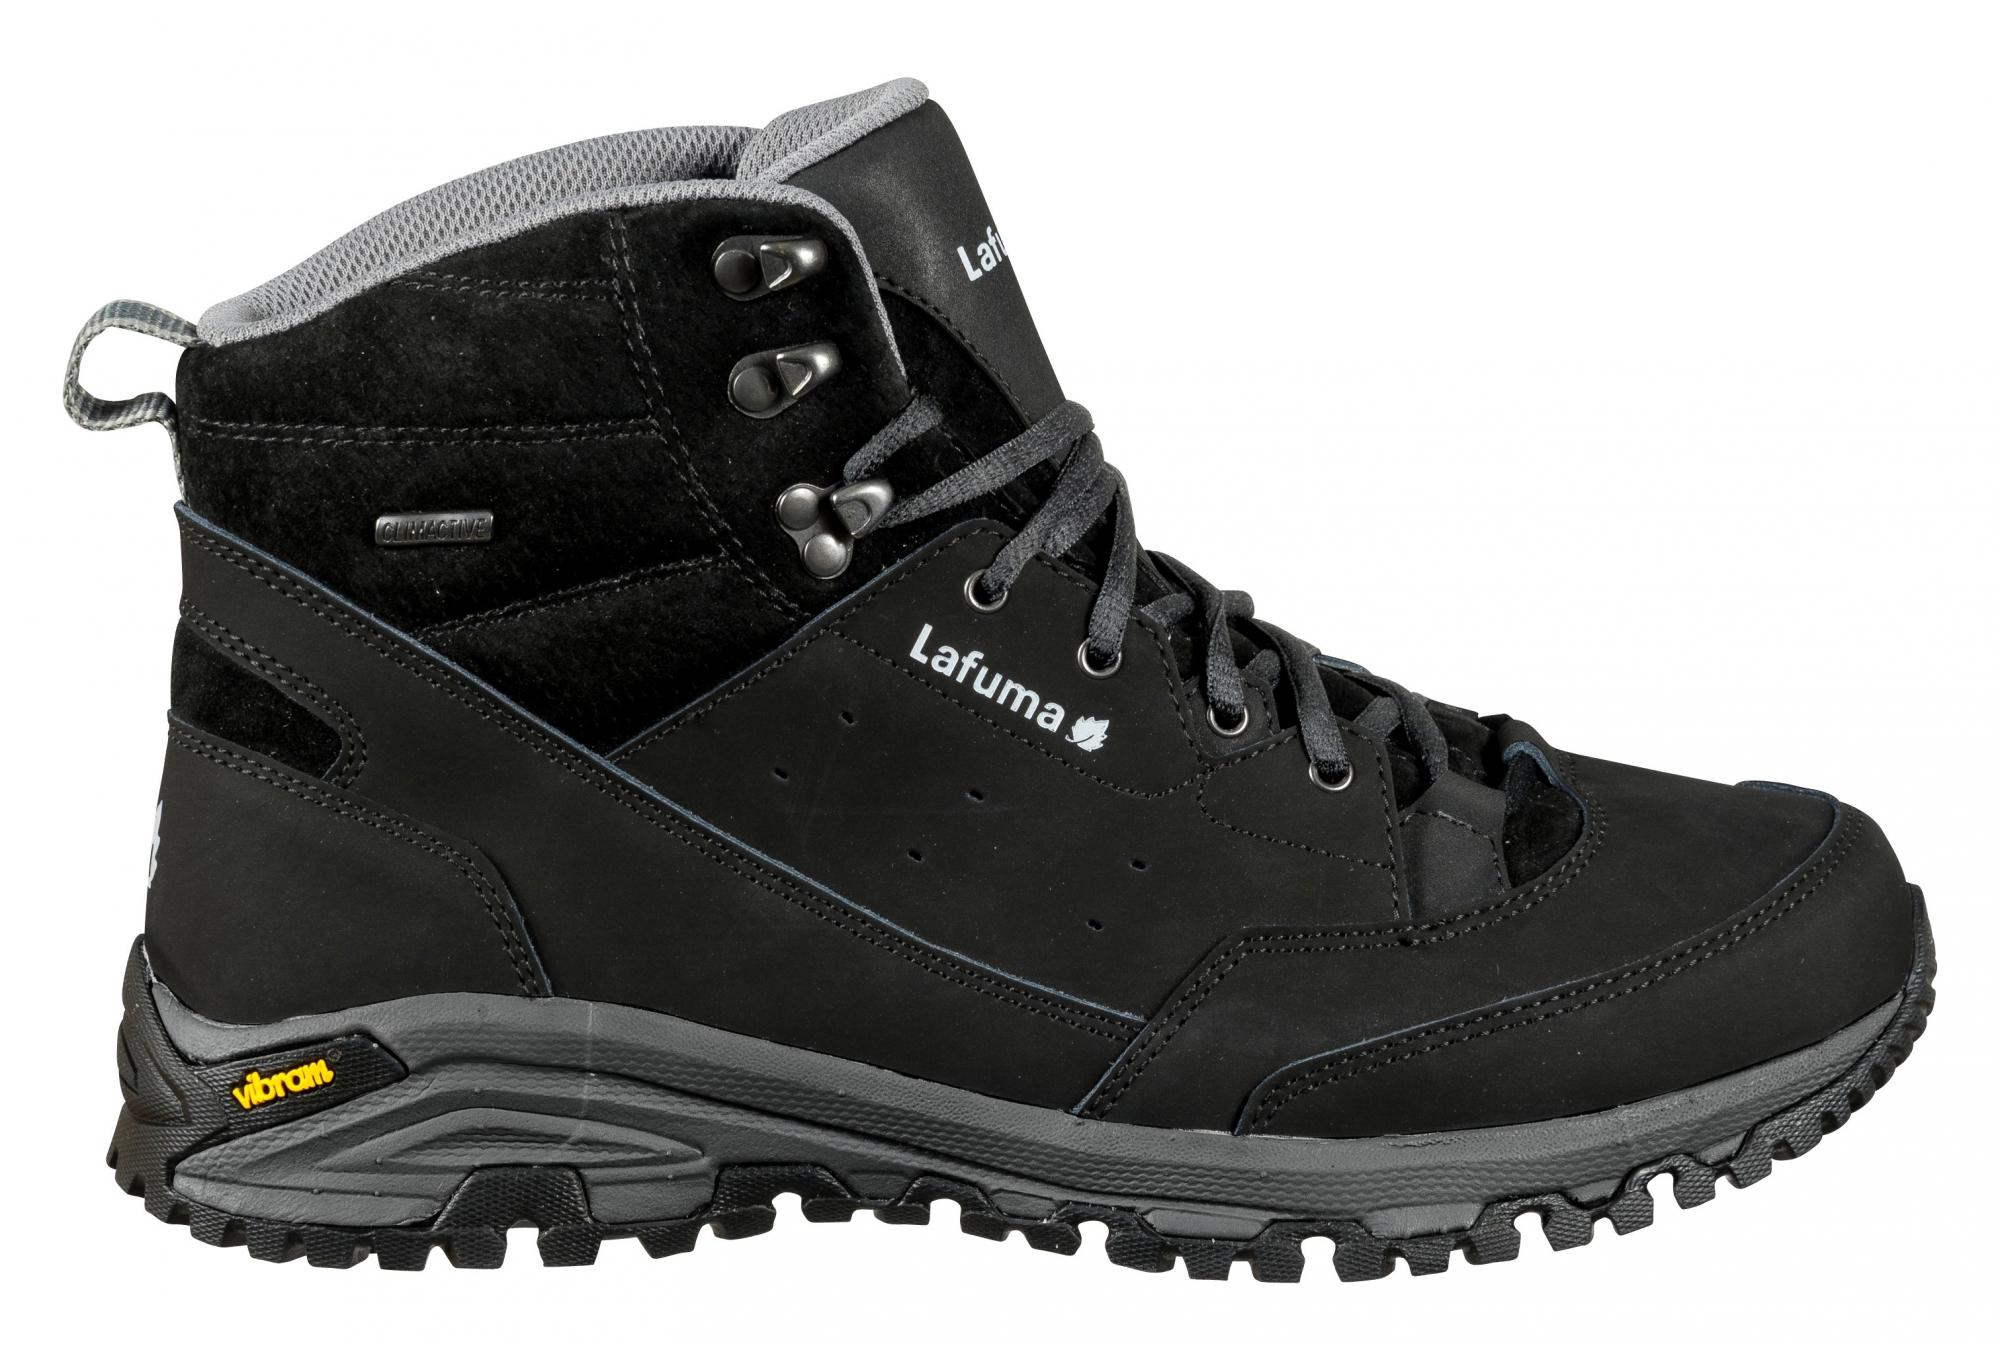 Randonnée Lafuma High Noir Aneto Chaussures Cl De vpx0UwU